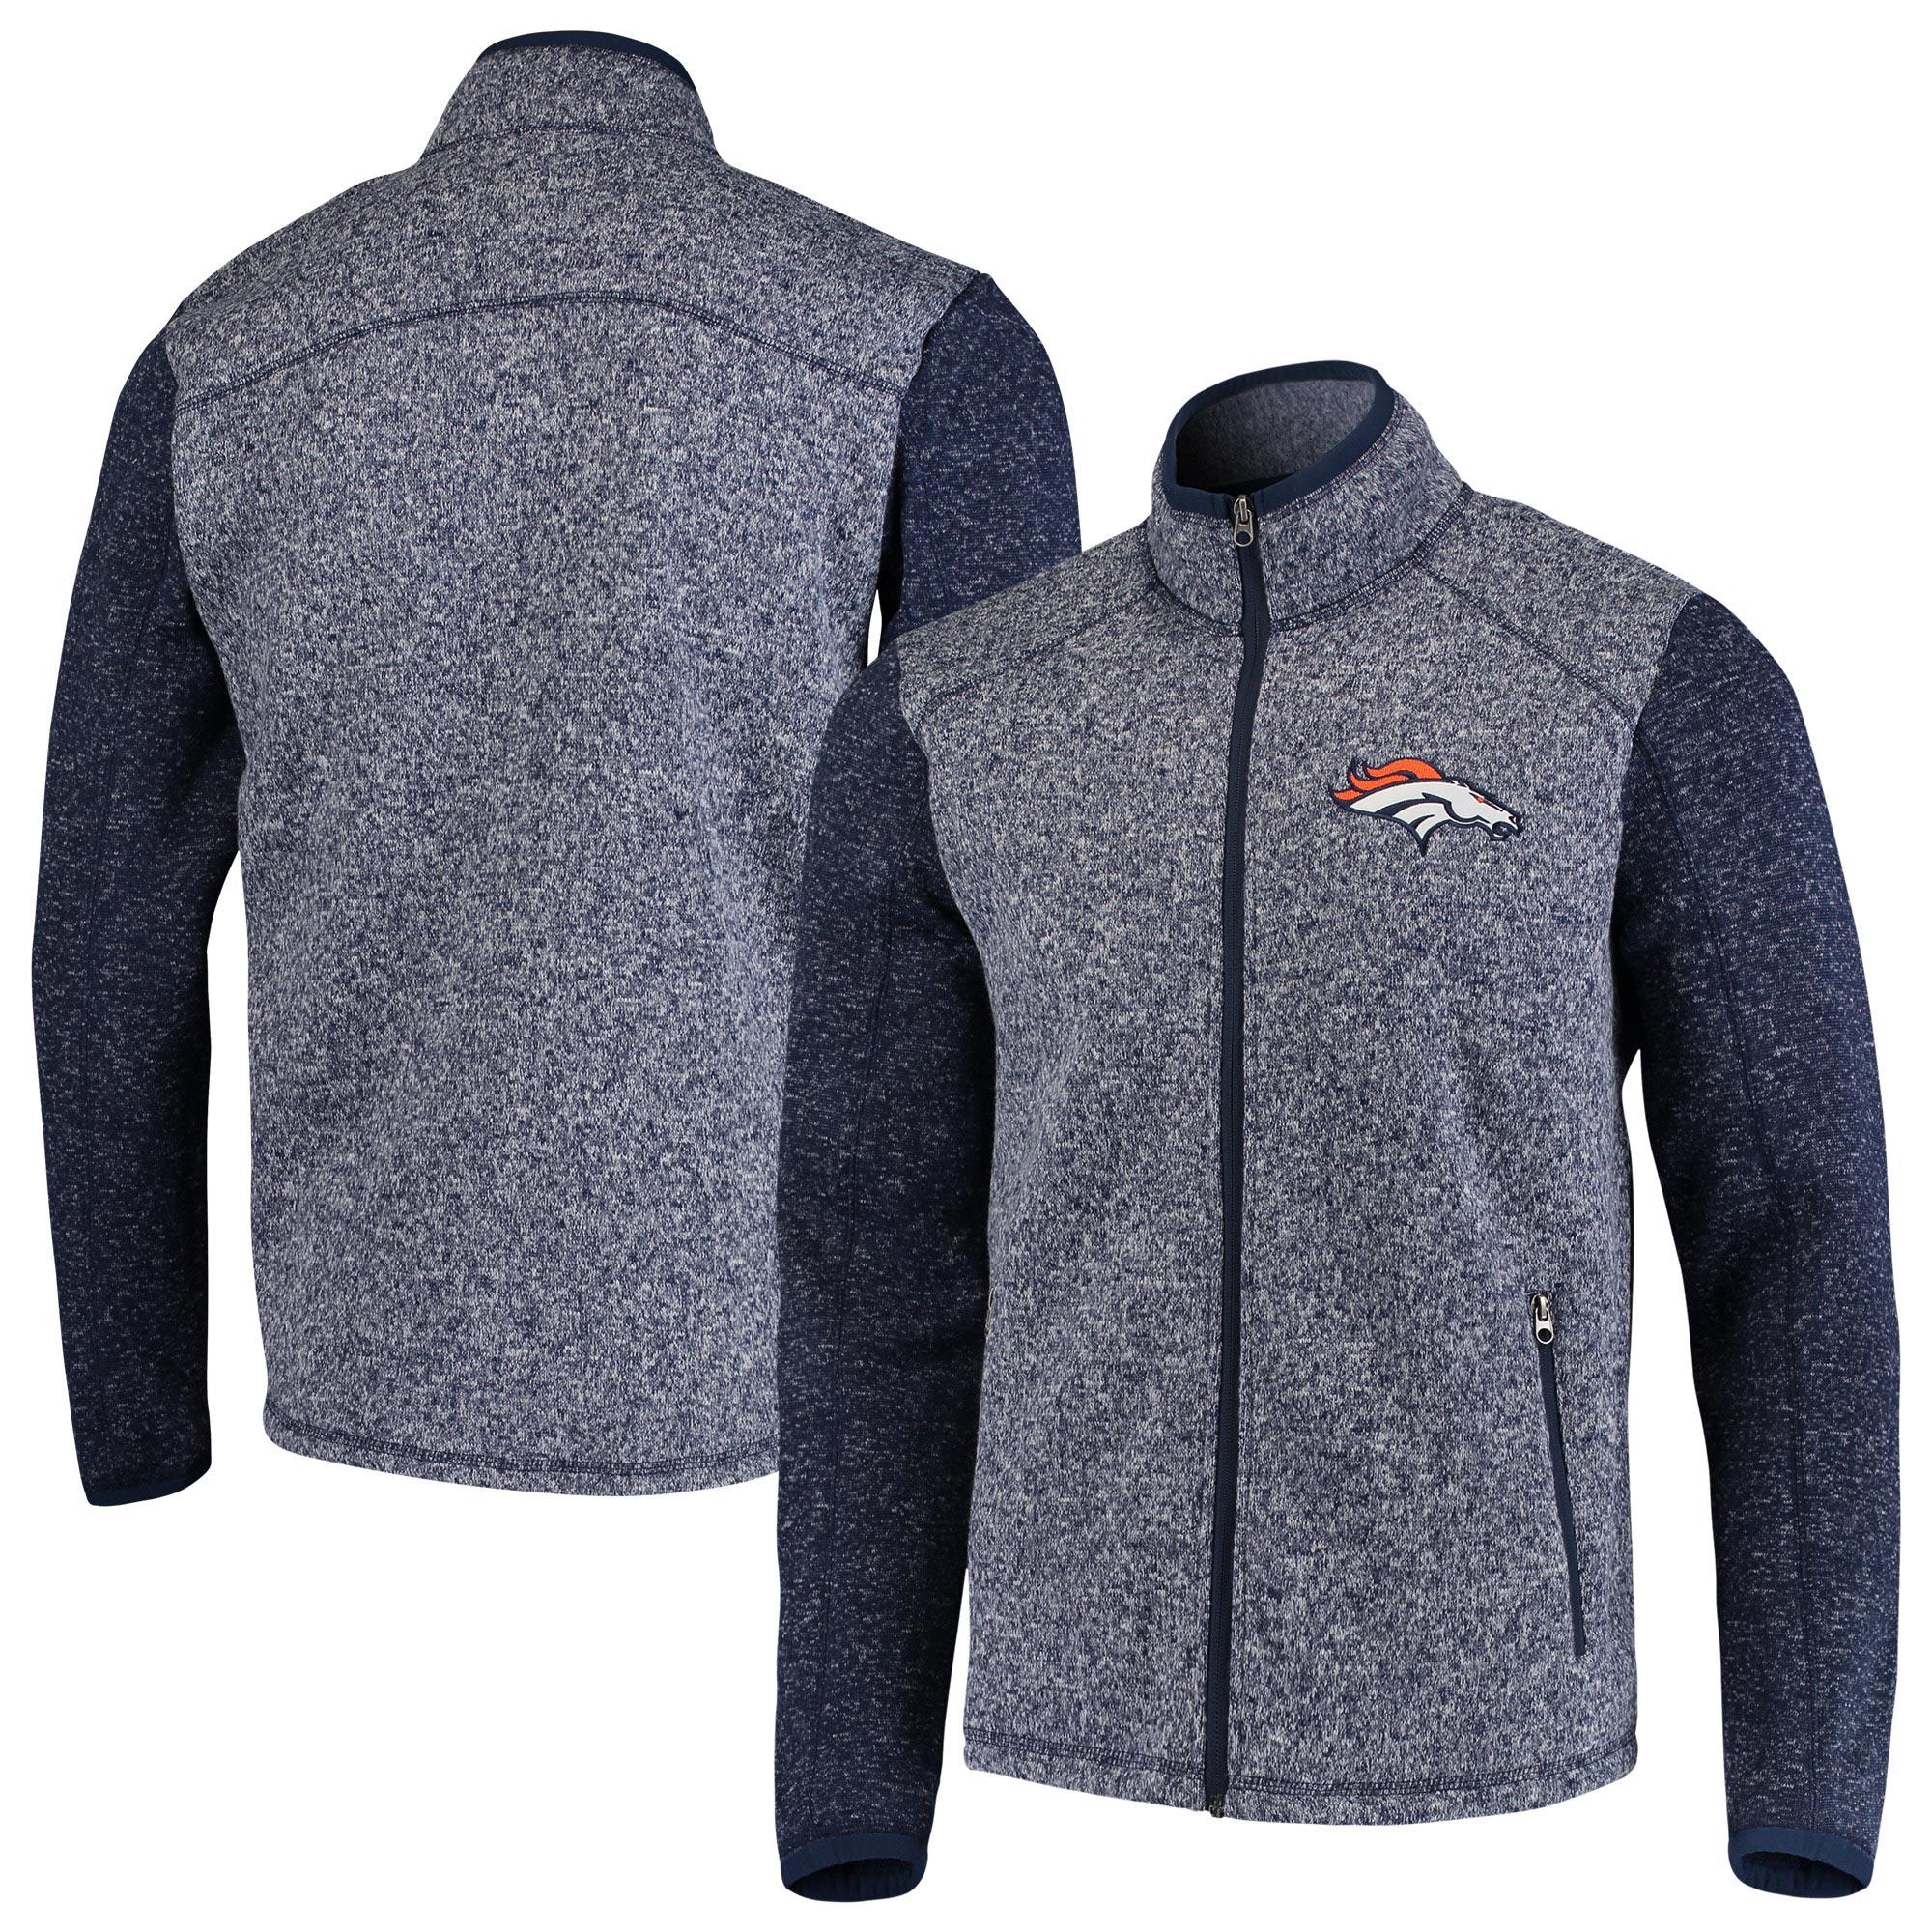 Denver Broncos G-III Sports by Carl Banks Alpine Zone Sweater Fleece Full-Zip Jacket - Heathered Navy